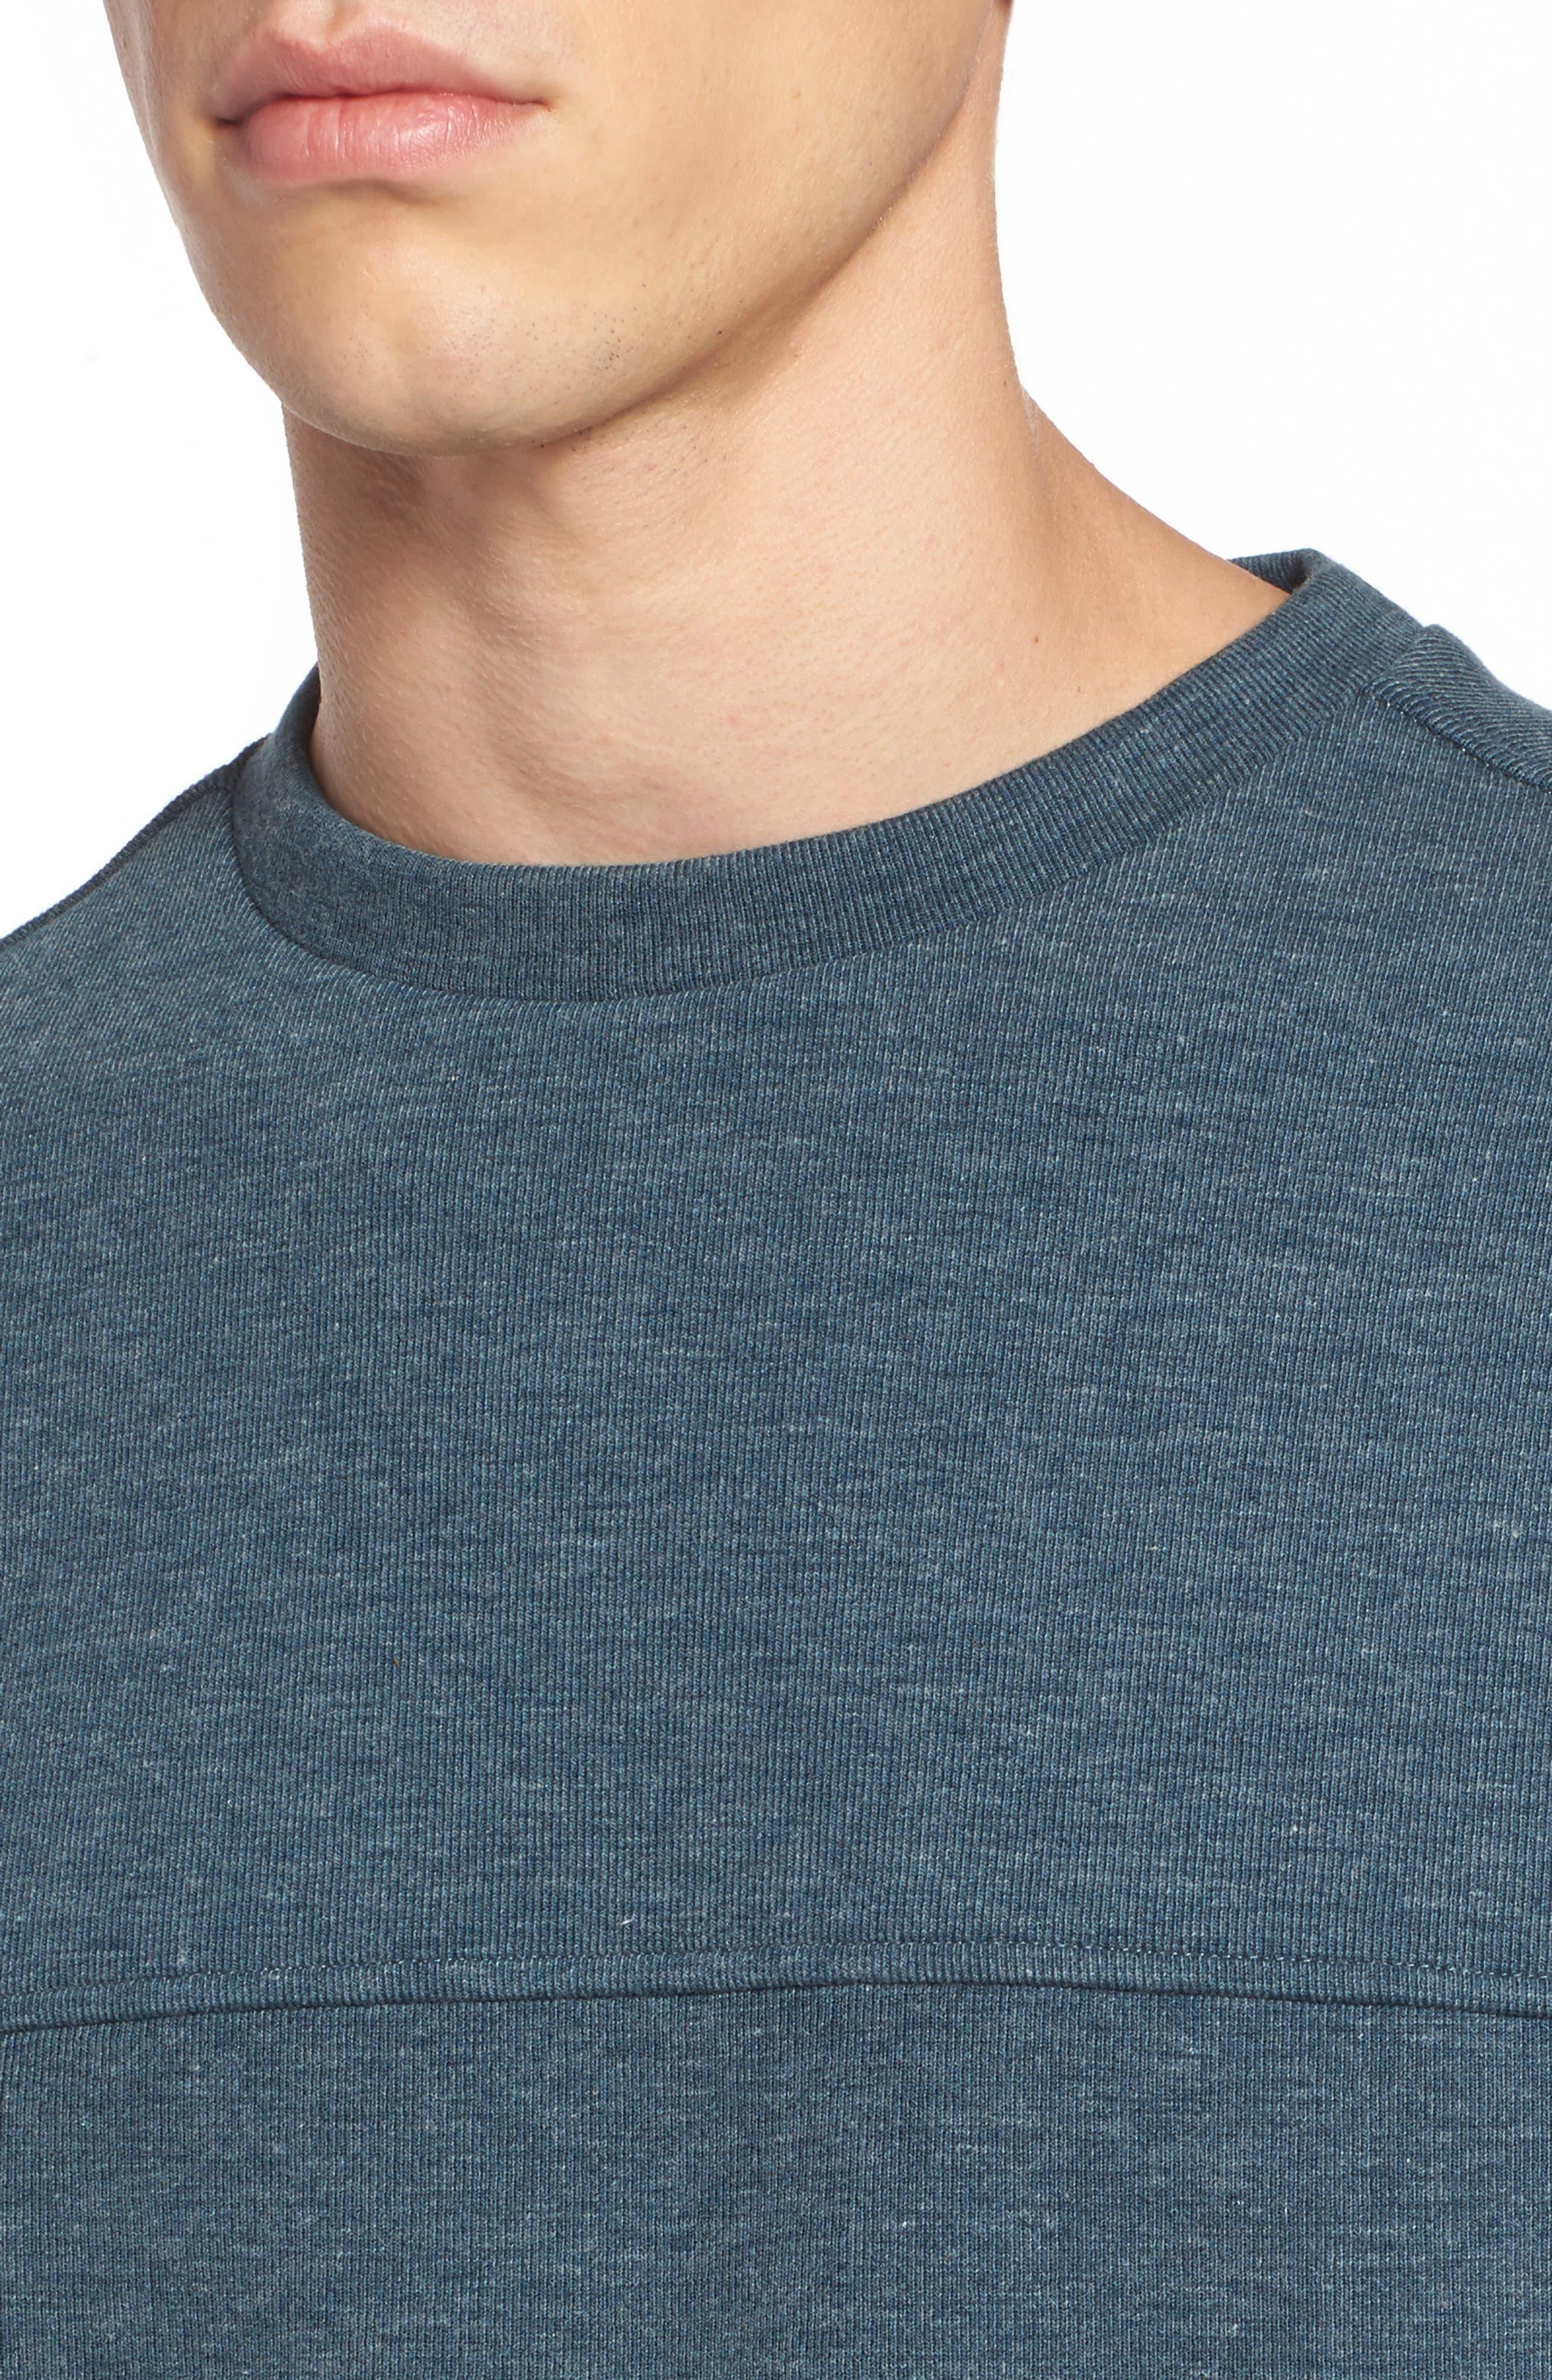 Onyx T-Shirt,                             Alternate thumbnail 4, color,                             Teal